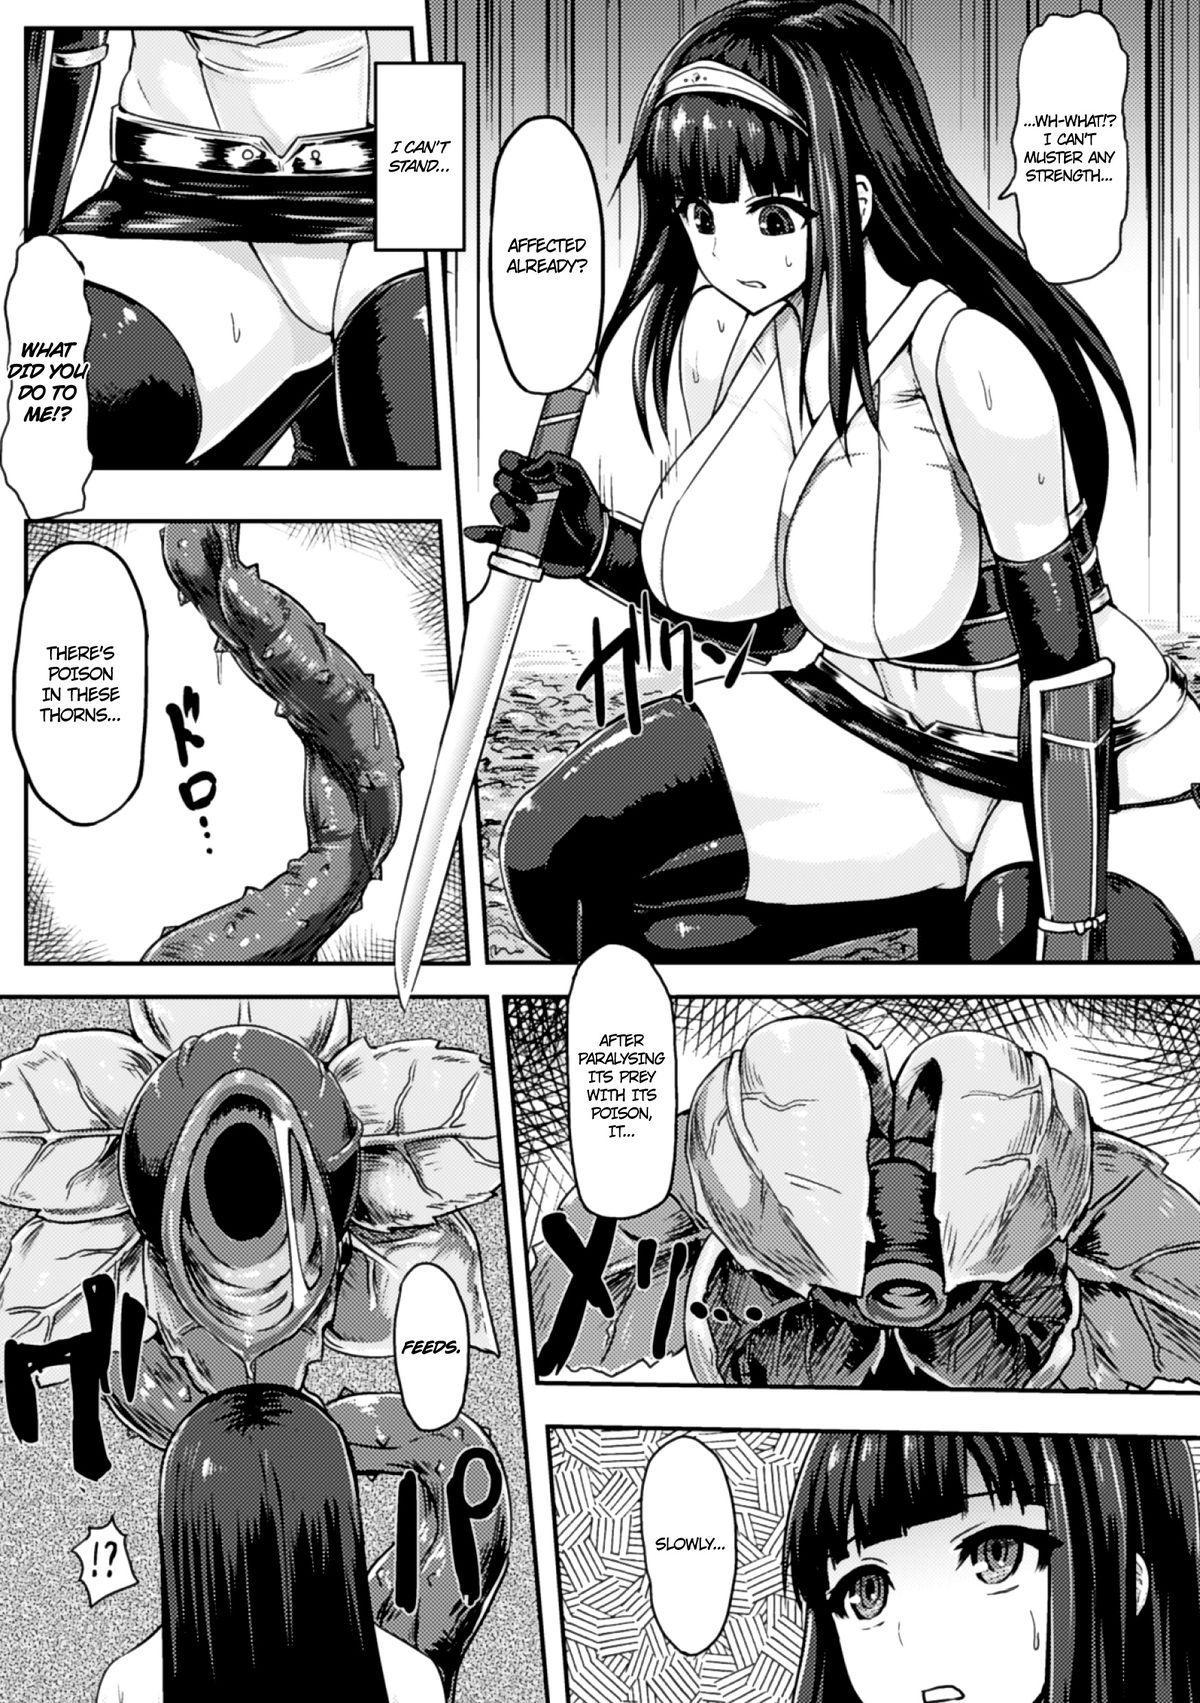 2D Comic Magazine Shokubutsukan de Monzetsu Acme Saki! Vol. 2 6